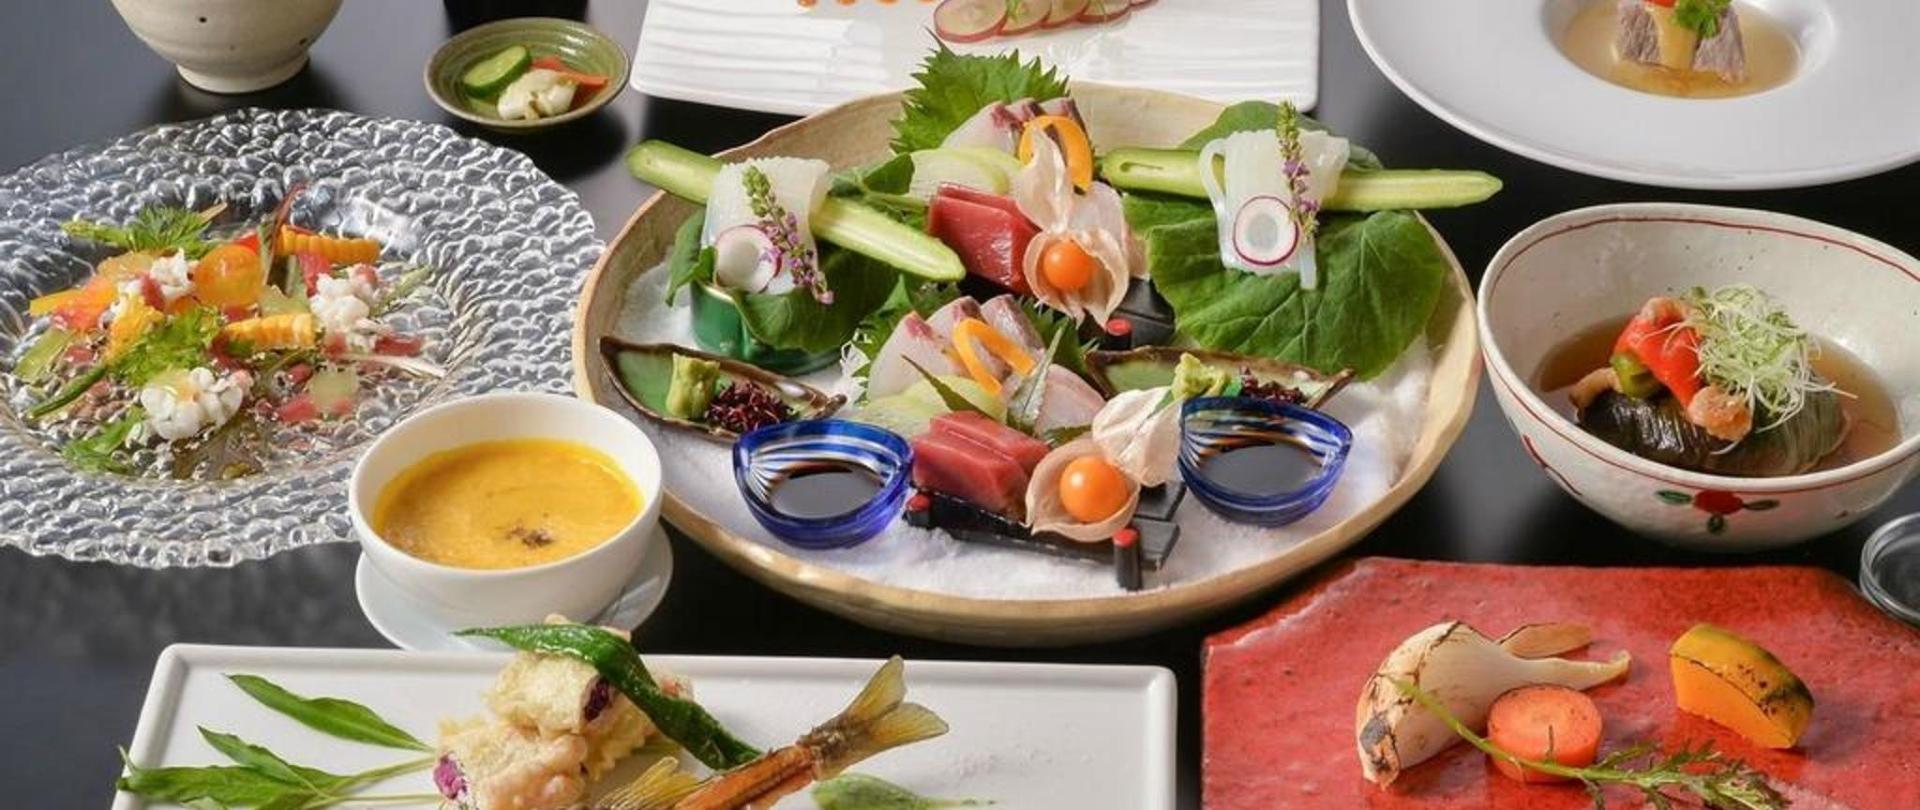 dinner-kattusai-jpg-1.jpg.1024x0.jpg